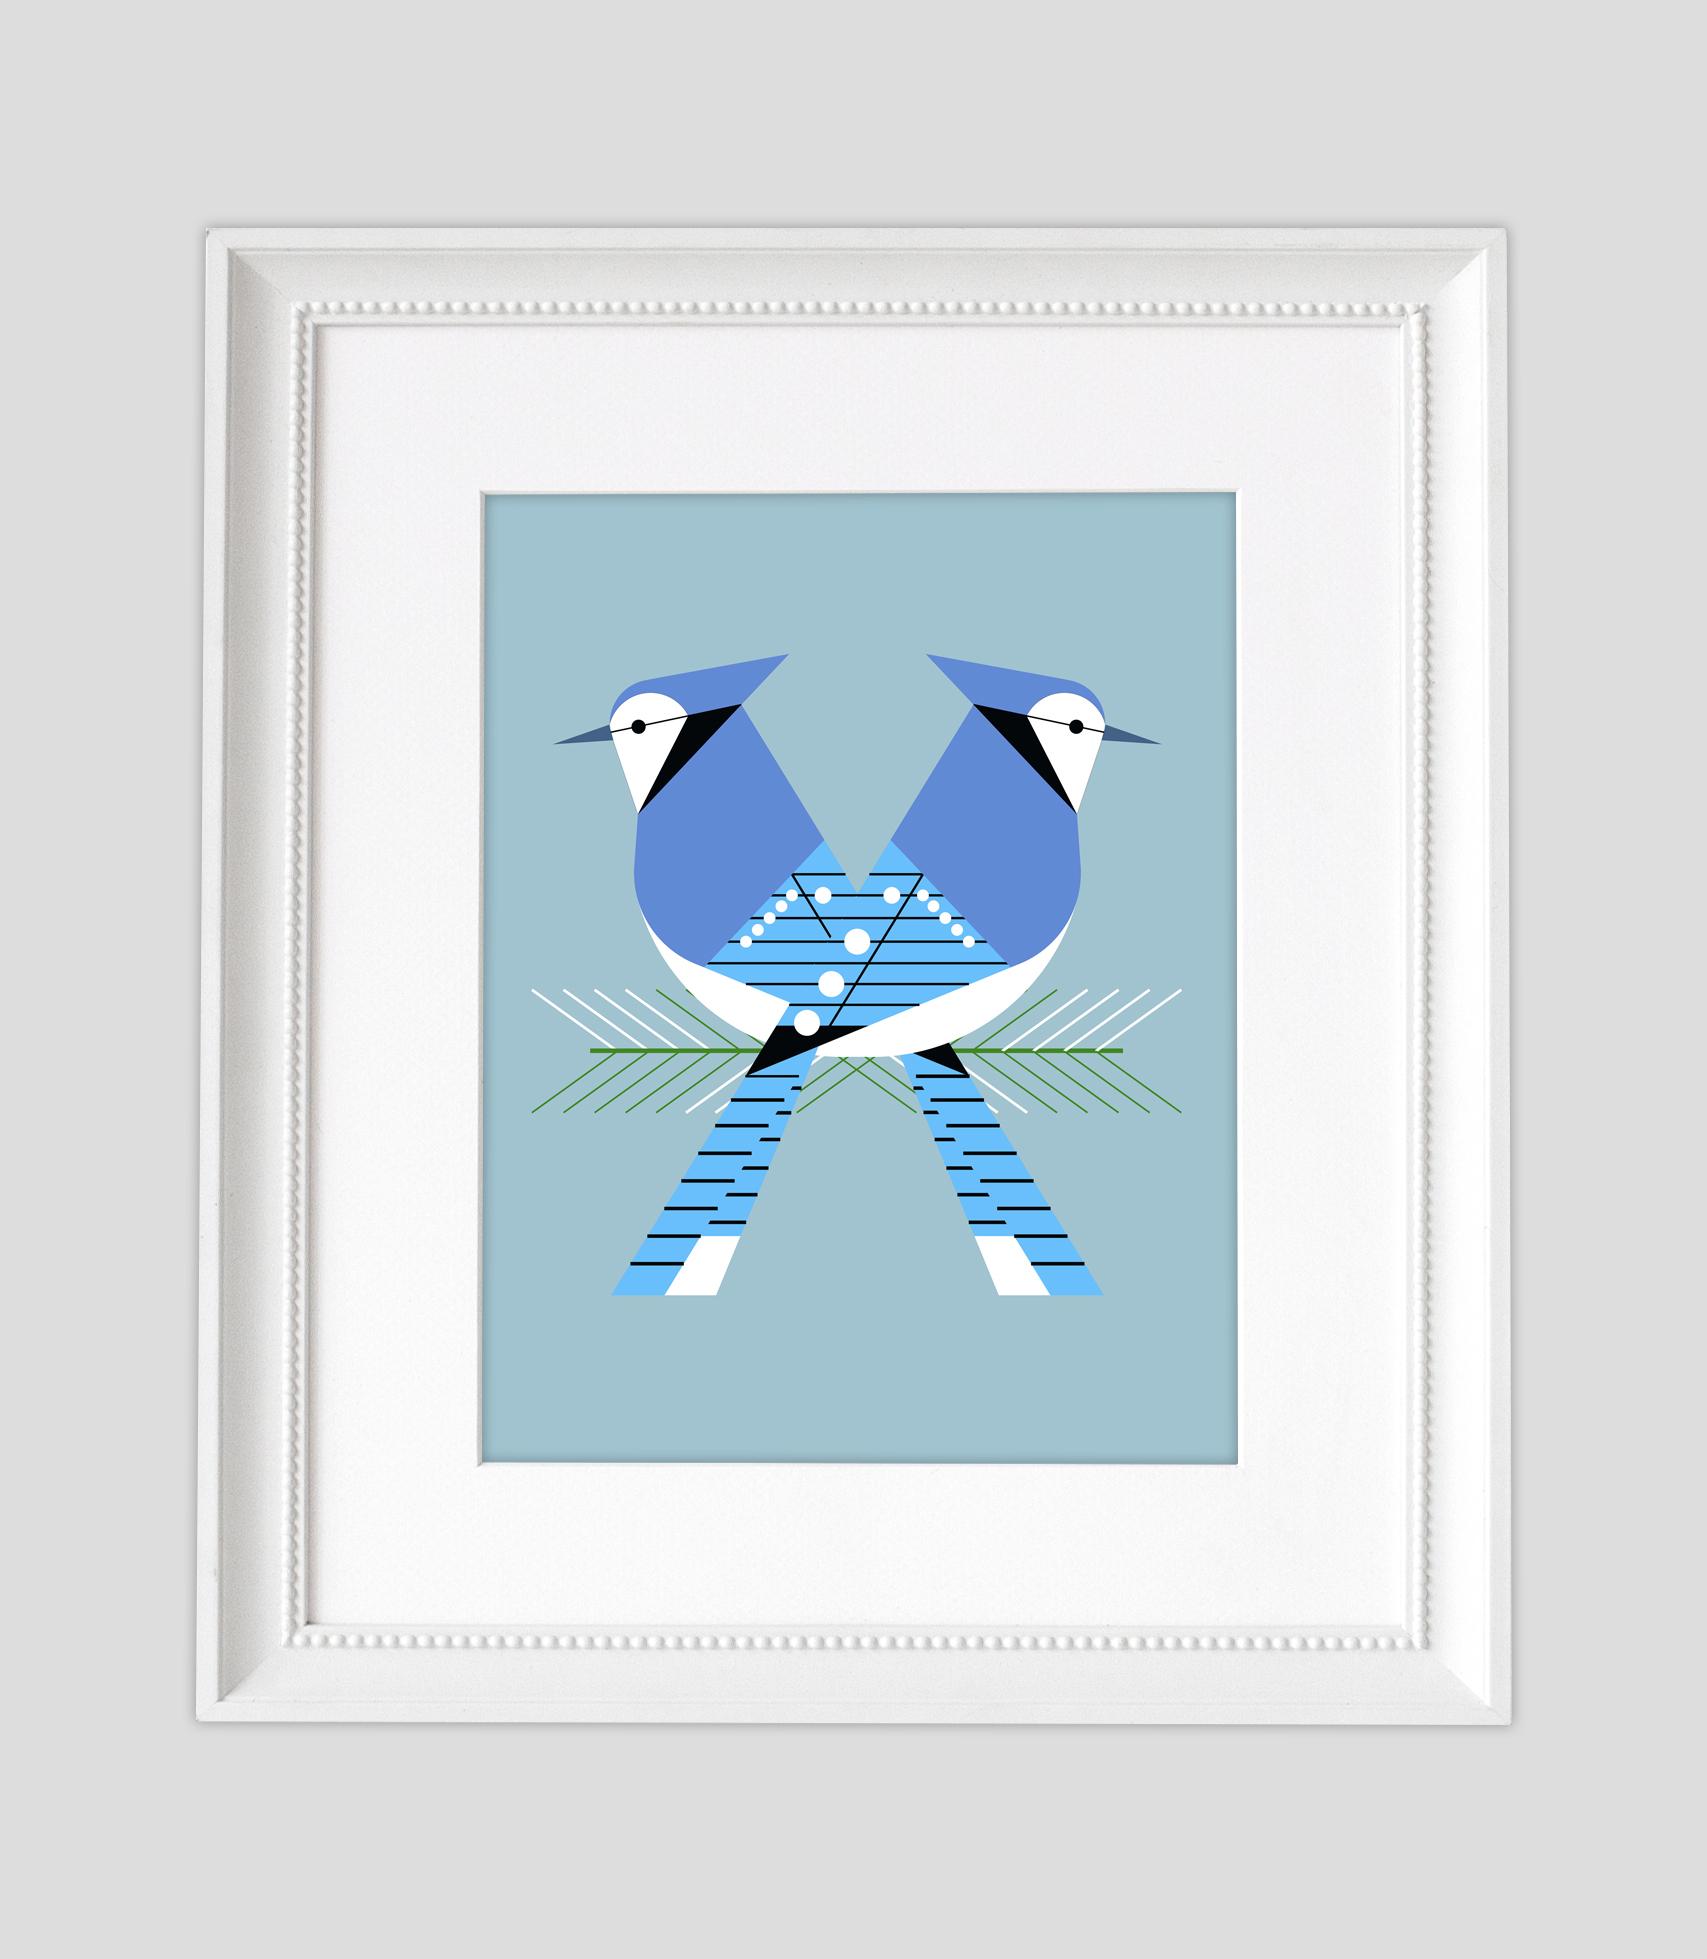 Bluejay Love Framed2.jpg